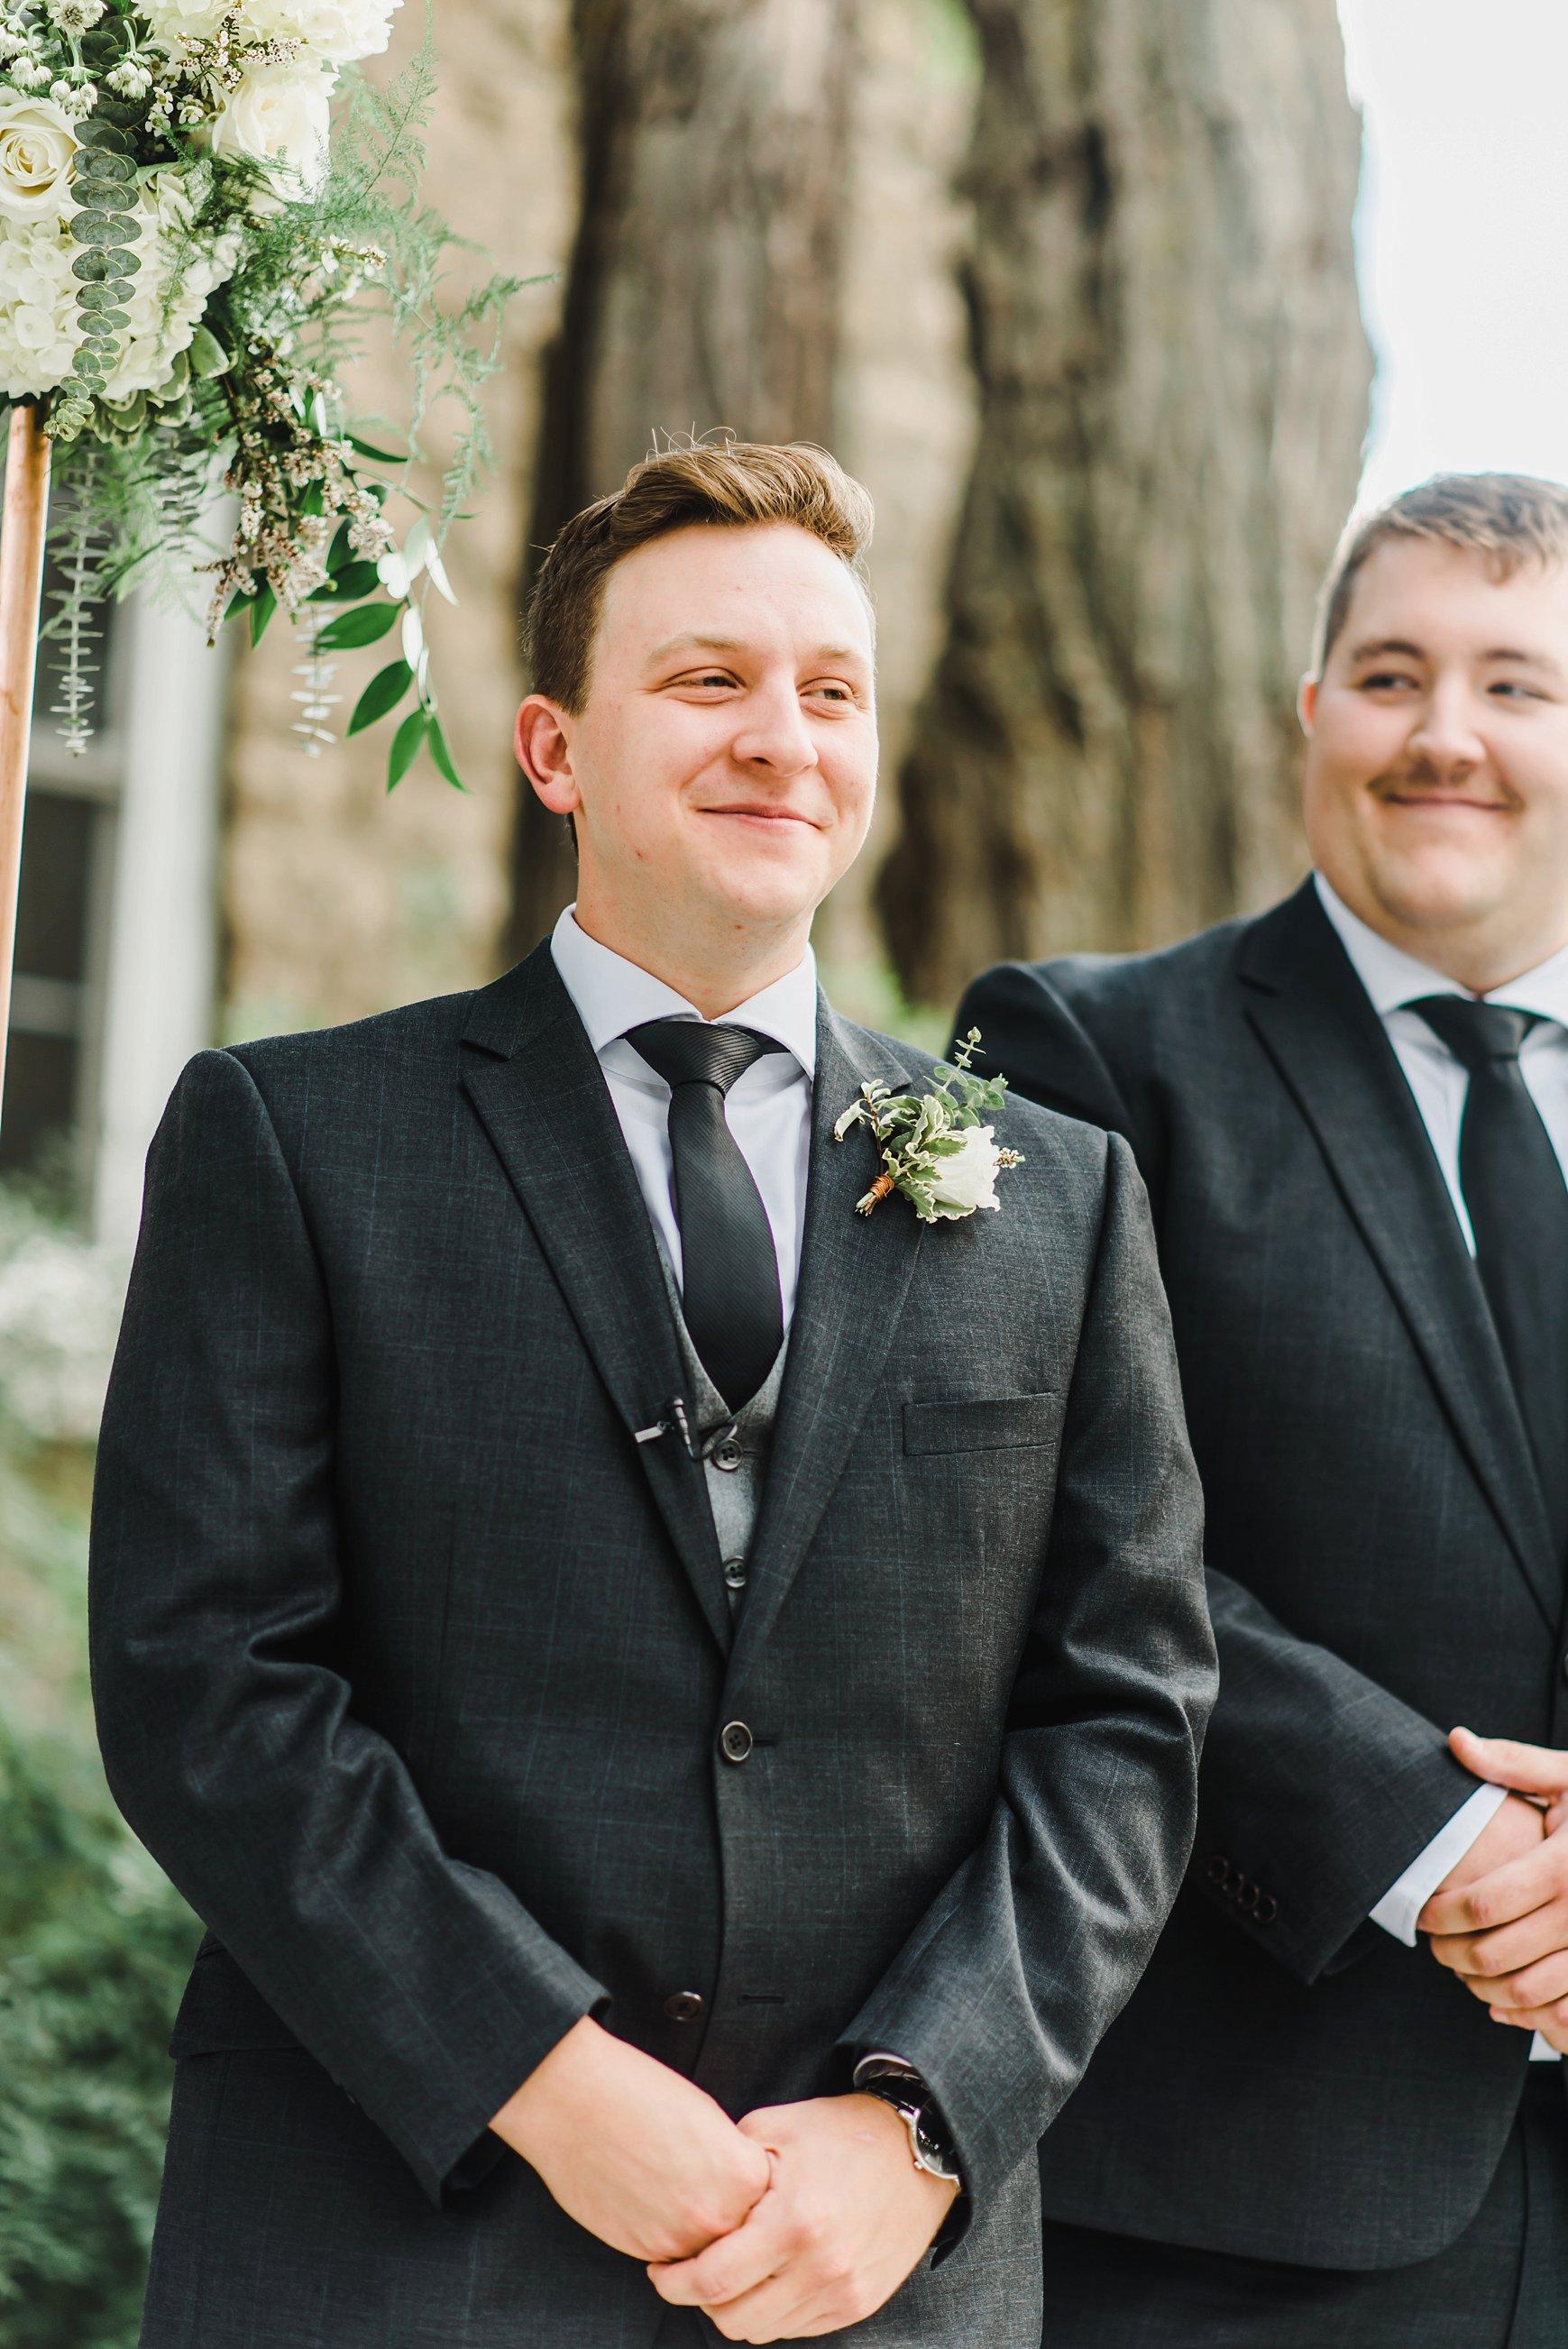 light airy indie fine art ottawa wedding photographer | Ali and Batoul Photography_1147.jpg